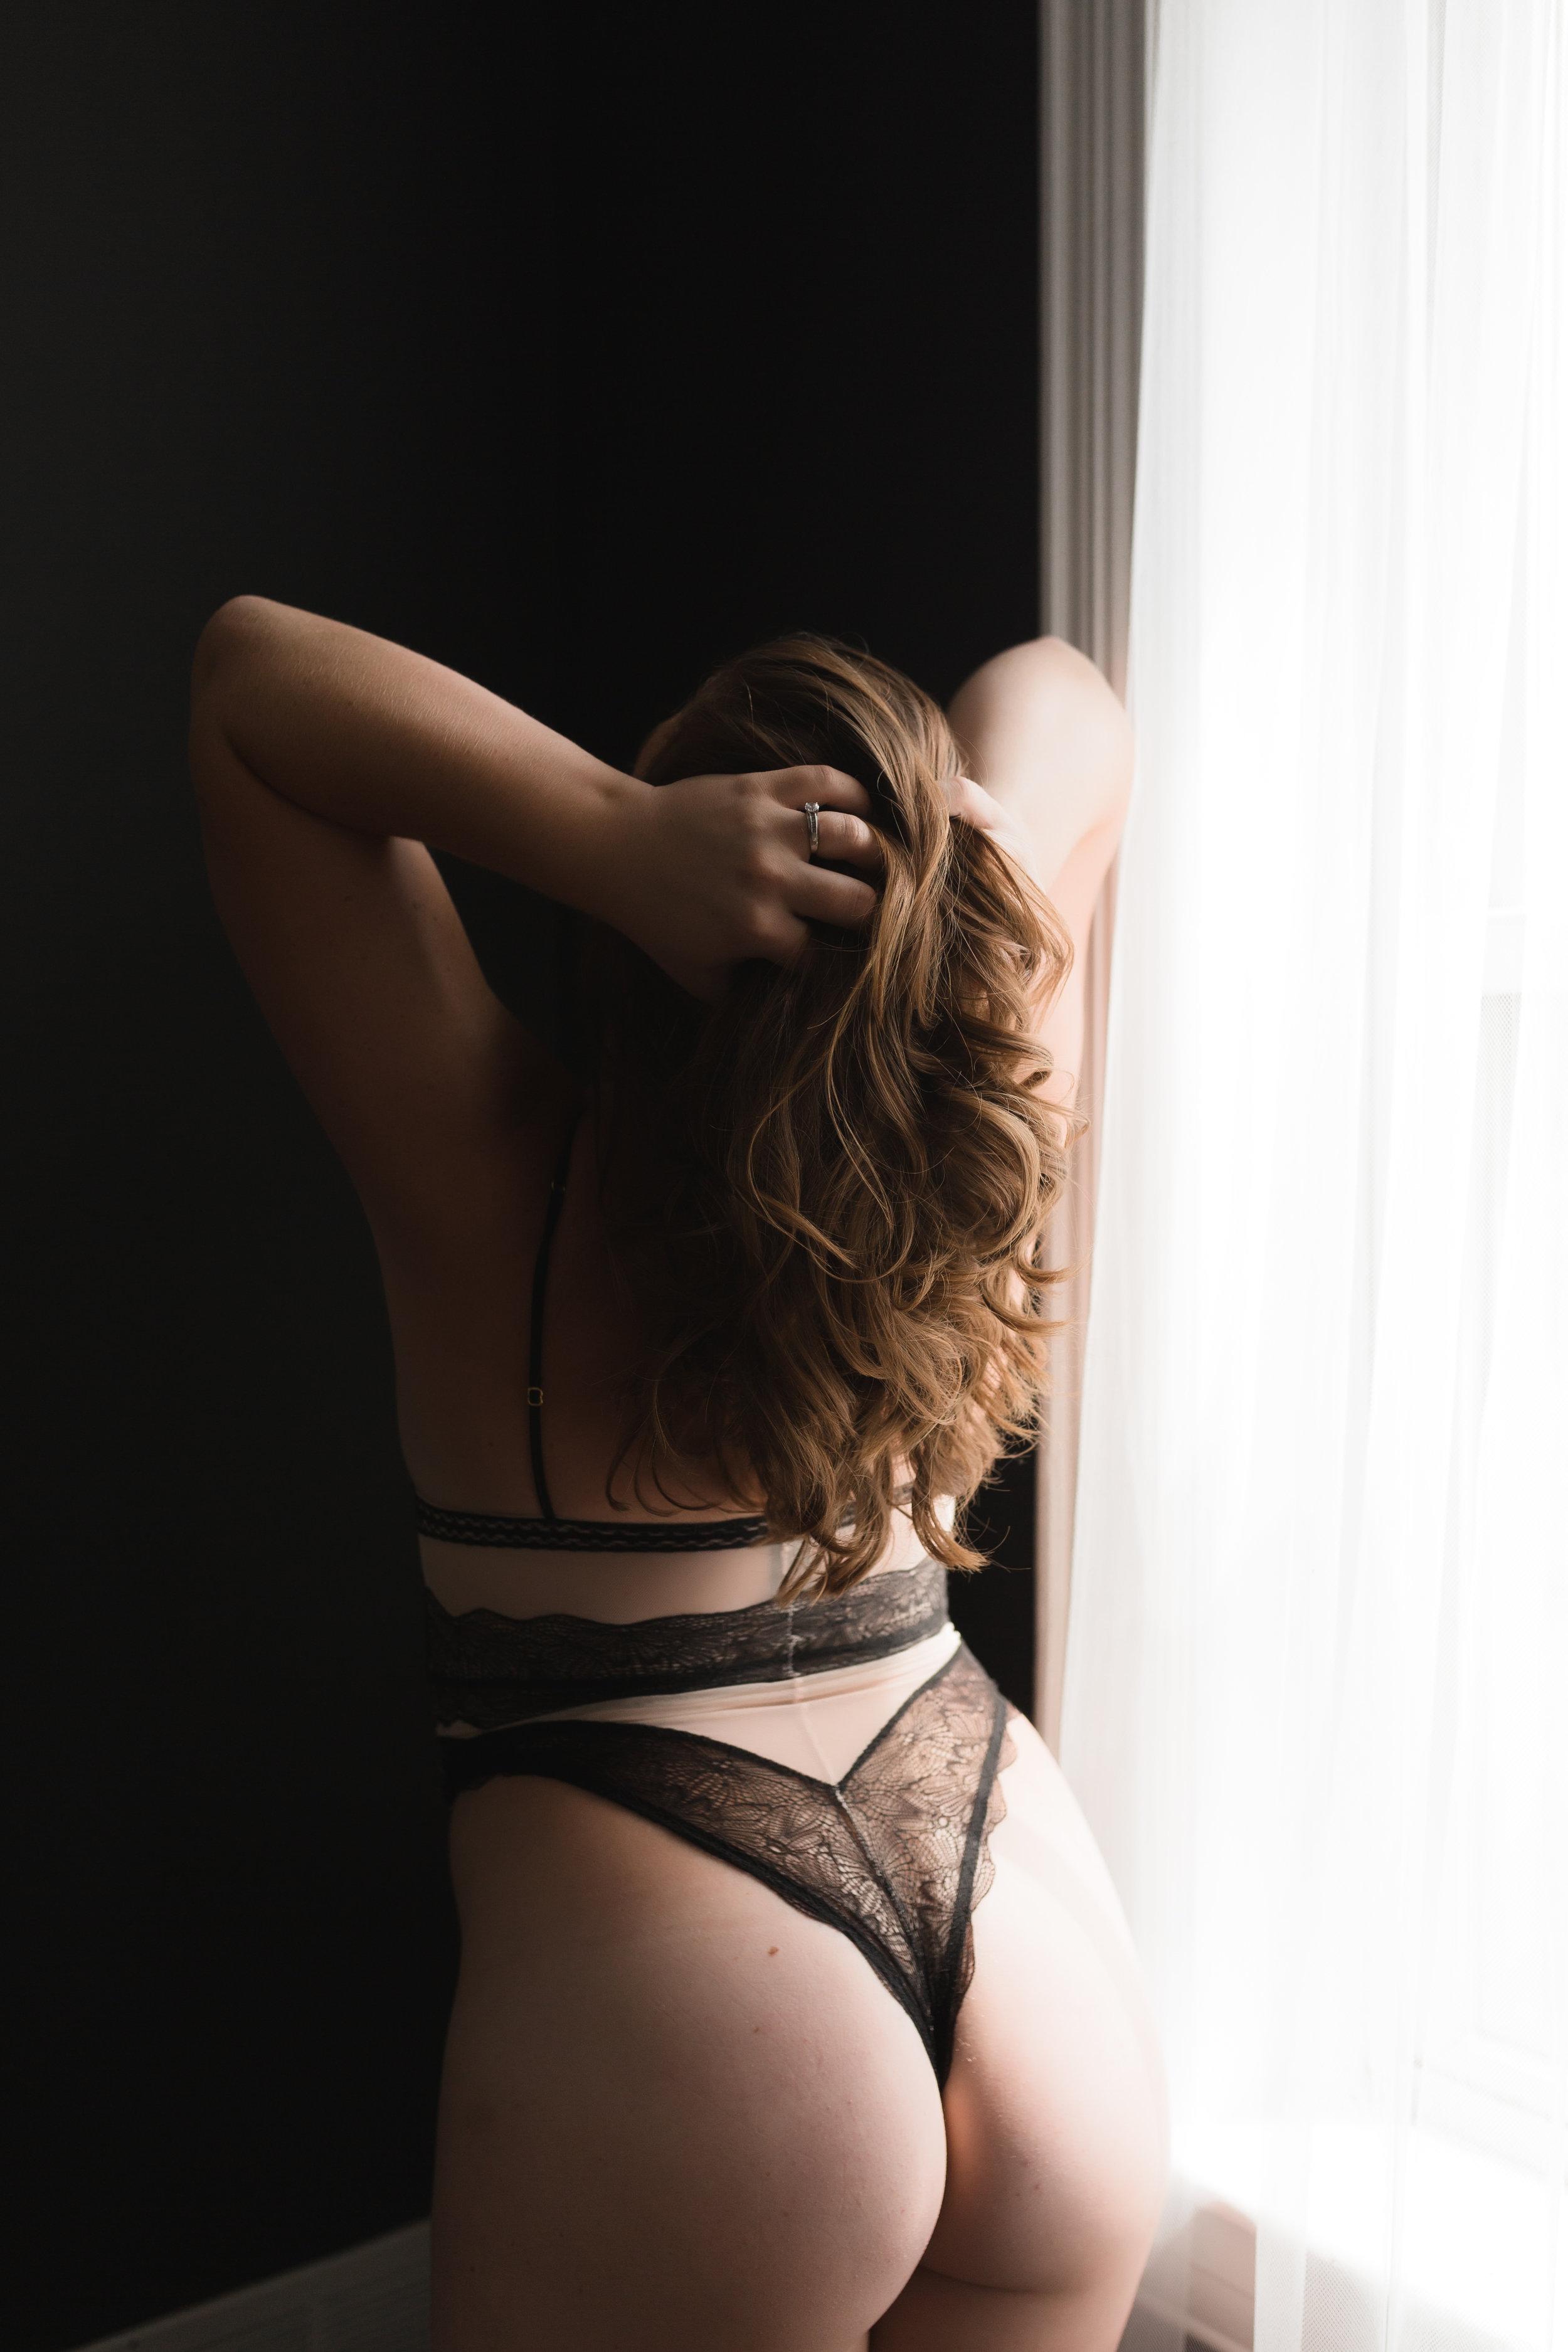 michigan_boudoir_photography_33.jpg